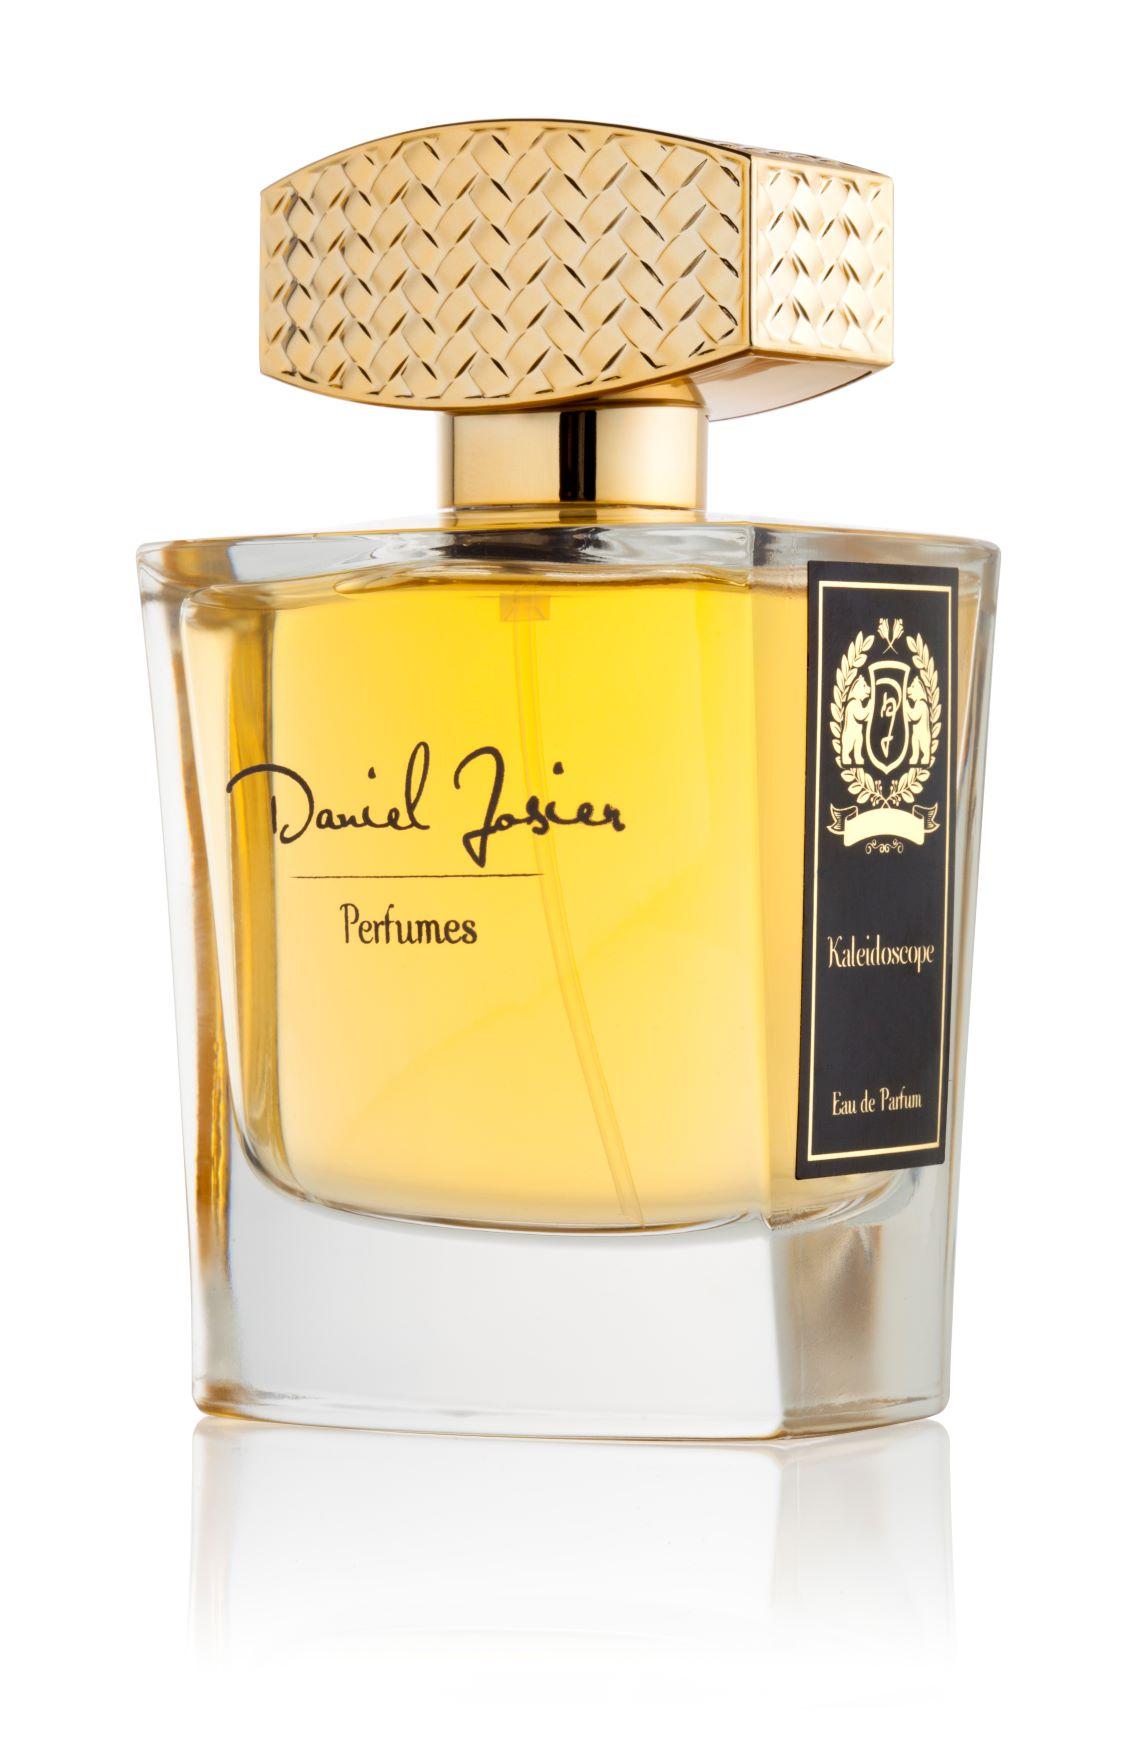 Daniel Josier – Kaleidoscope - Eau de Parfum